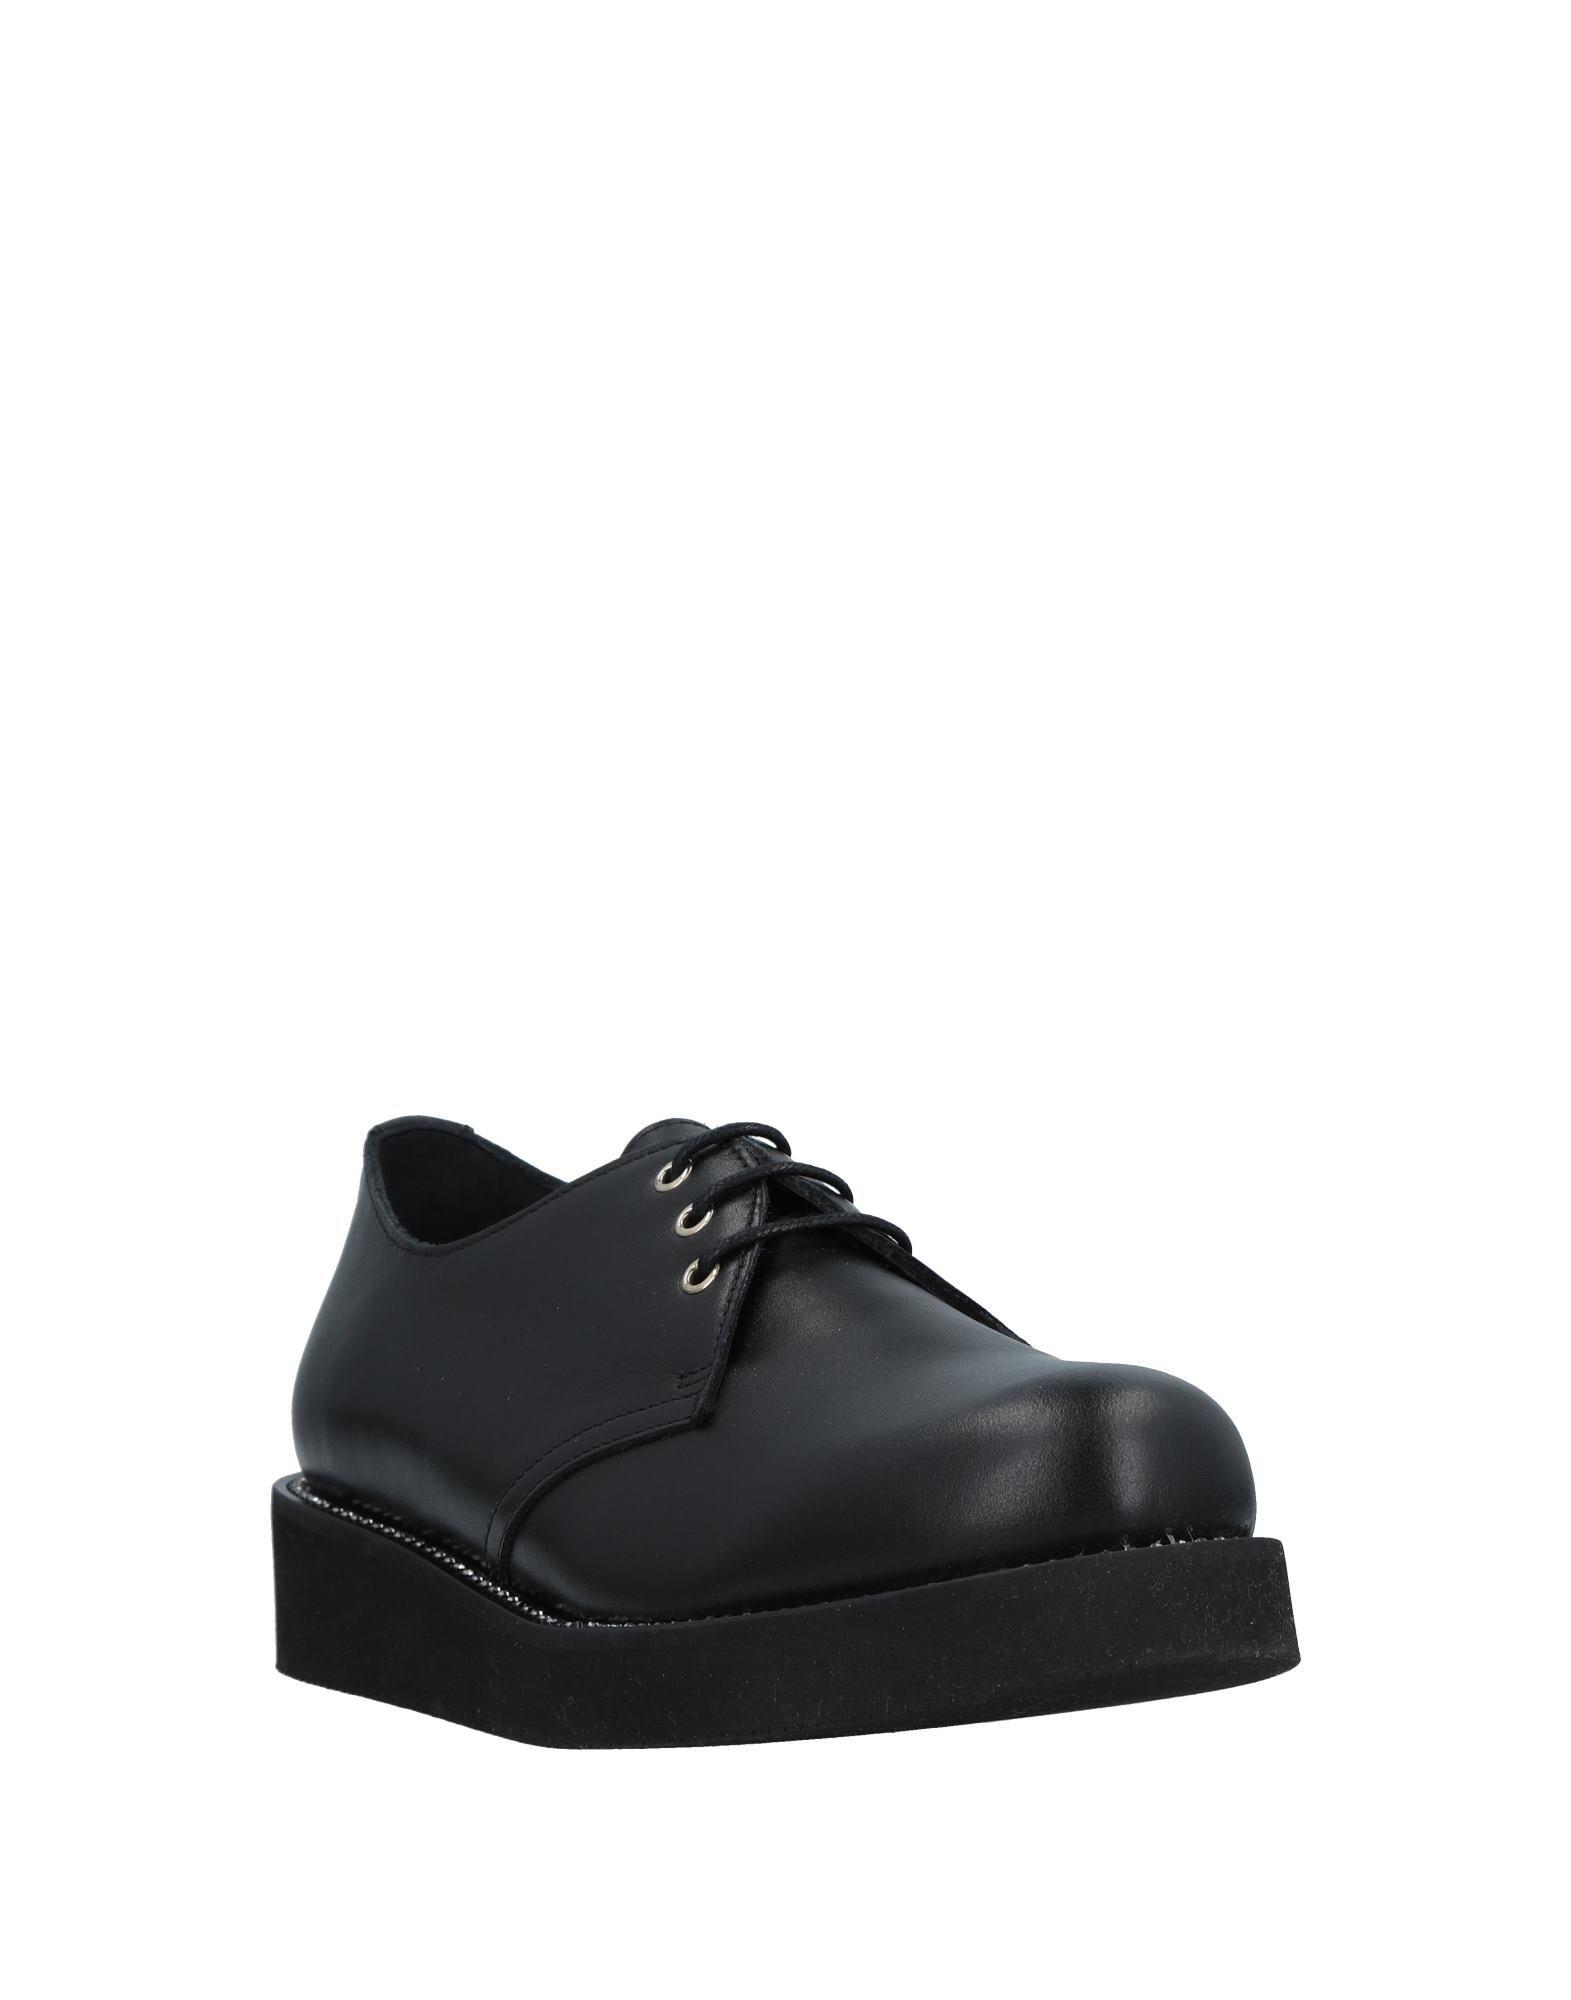 Gut Pepe um billige Schuhe zu tragenPatrizia Pepe Gut Schnürschuhe Damen  11523279RF cf50bf